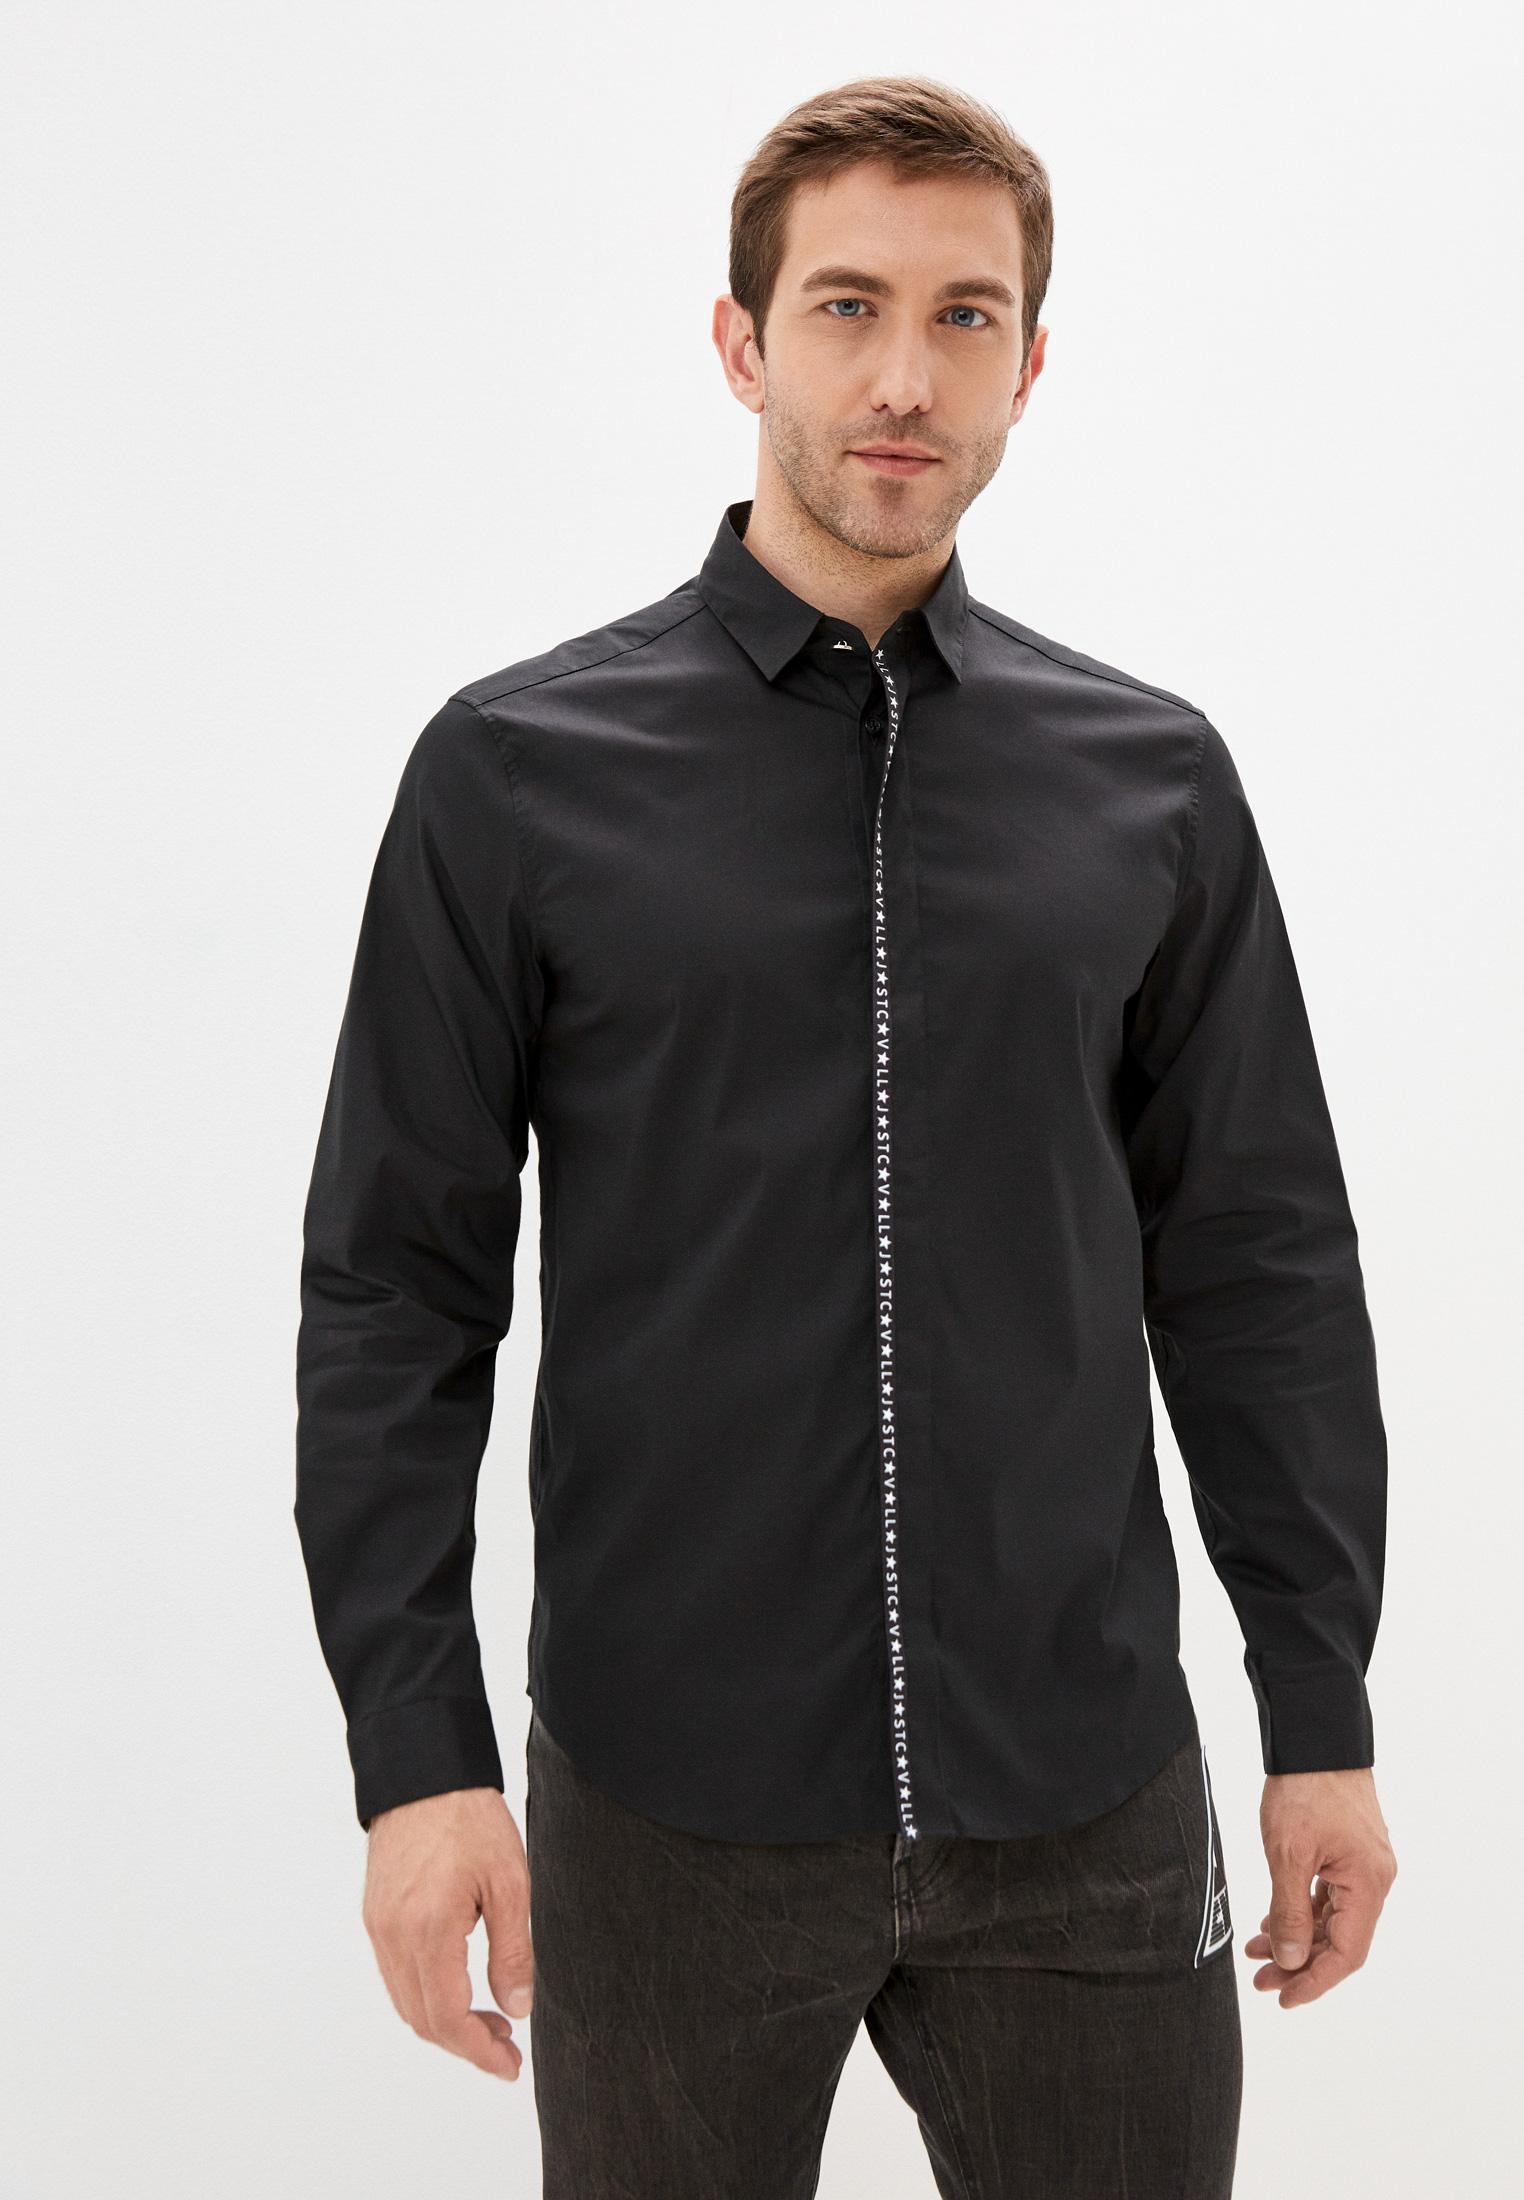 Рубашка с длинным рукавом Just Cavalli (Джаст Кавалли) S03DL0288 N38909